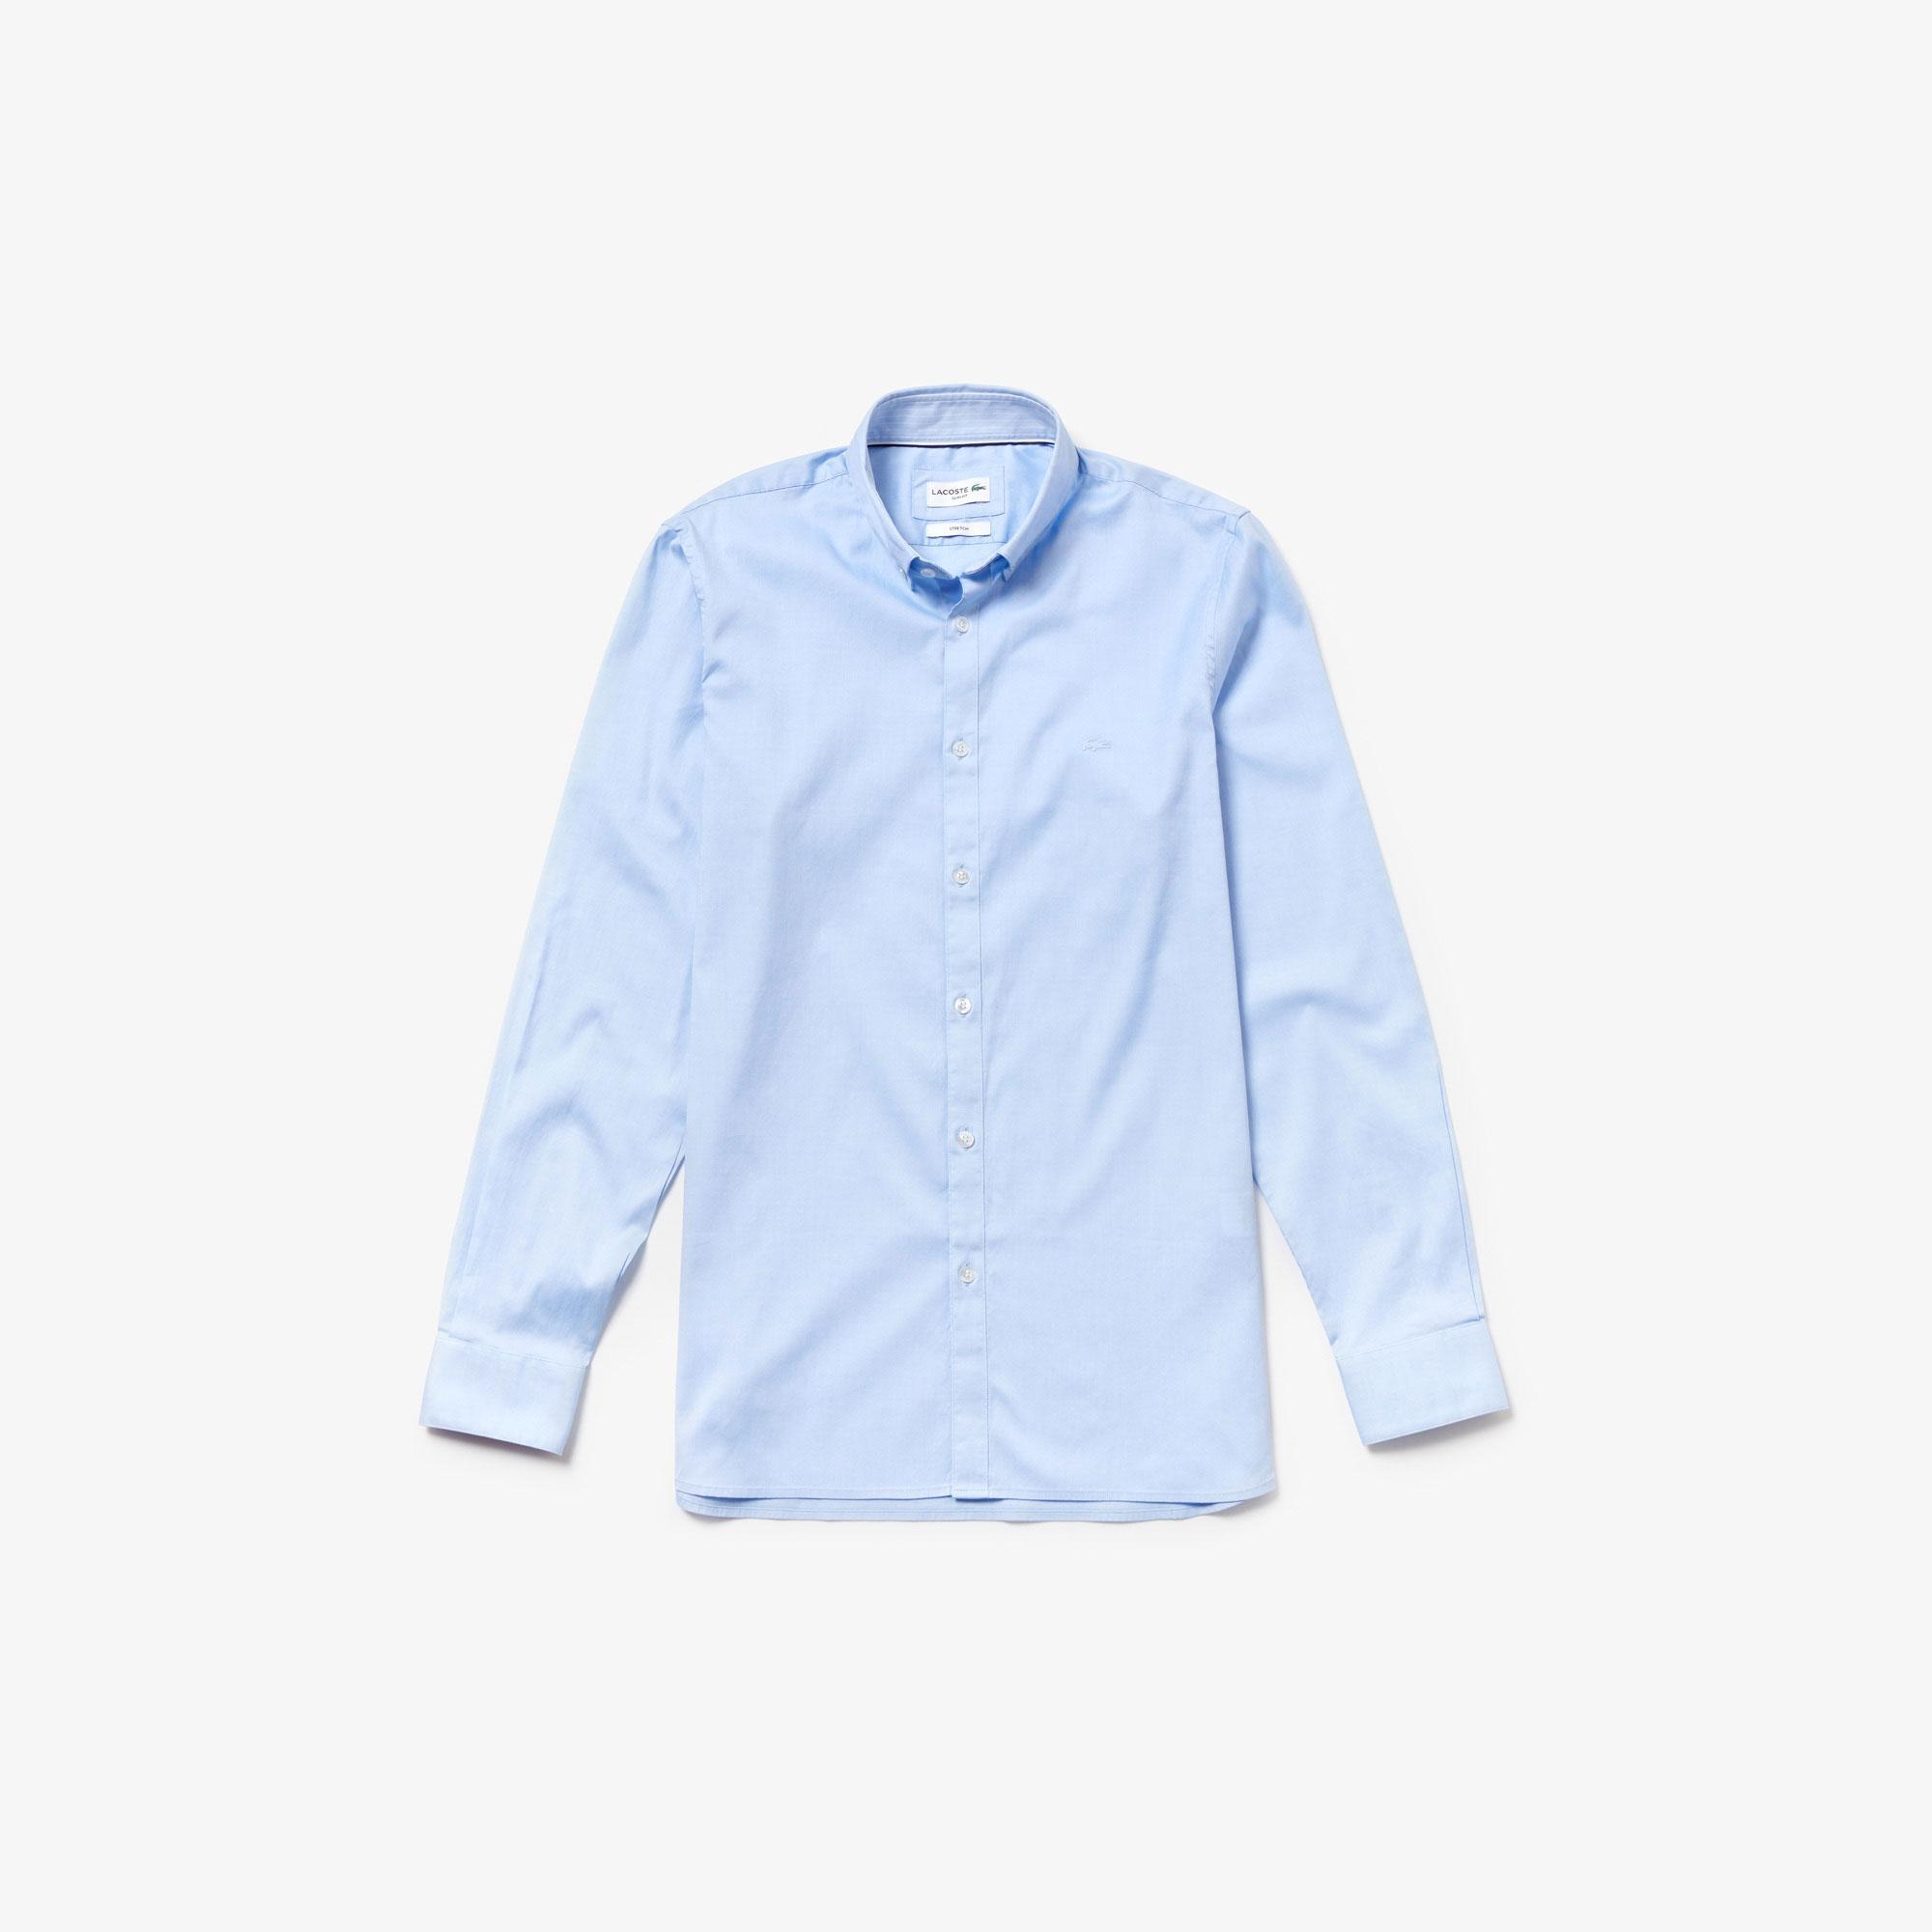 Lacoste Men's Long Sleeve Wovens Shirt